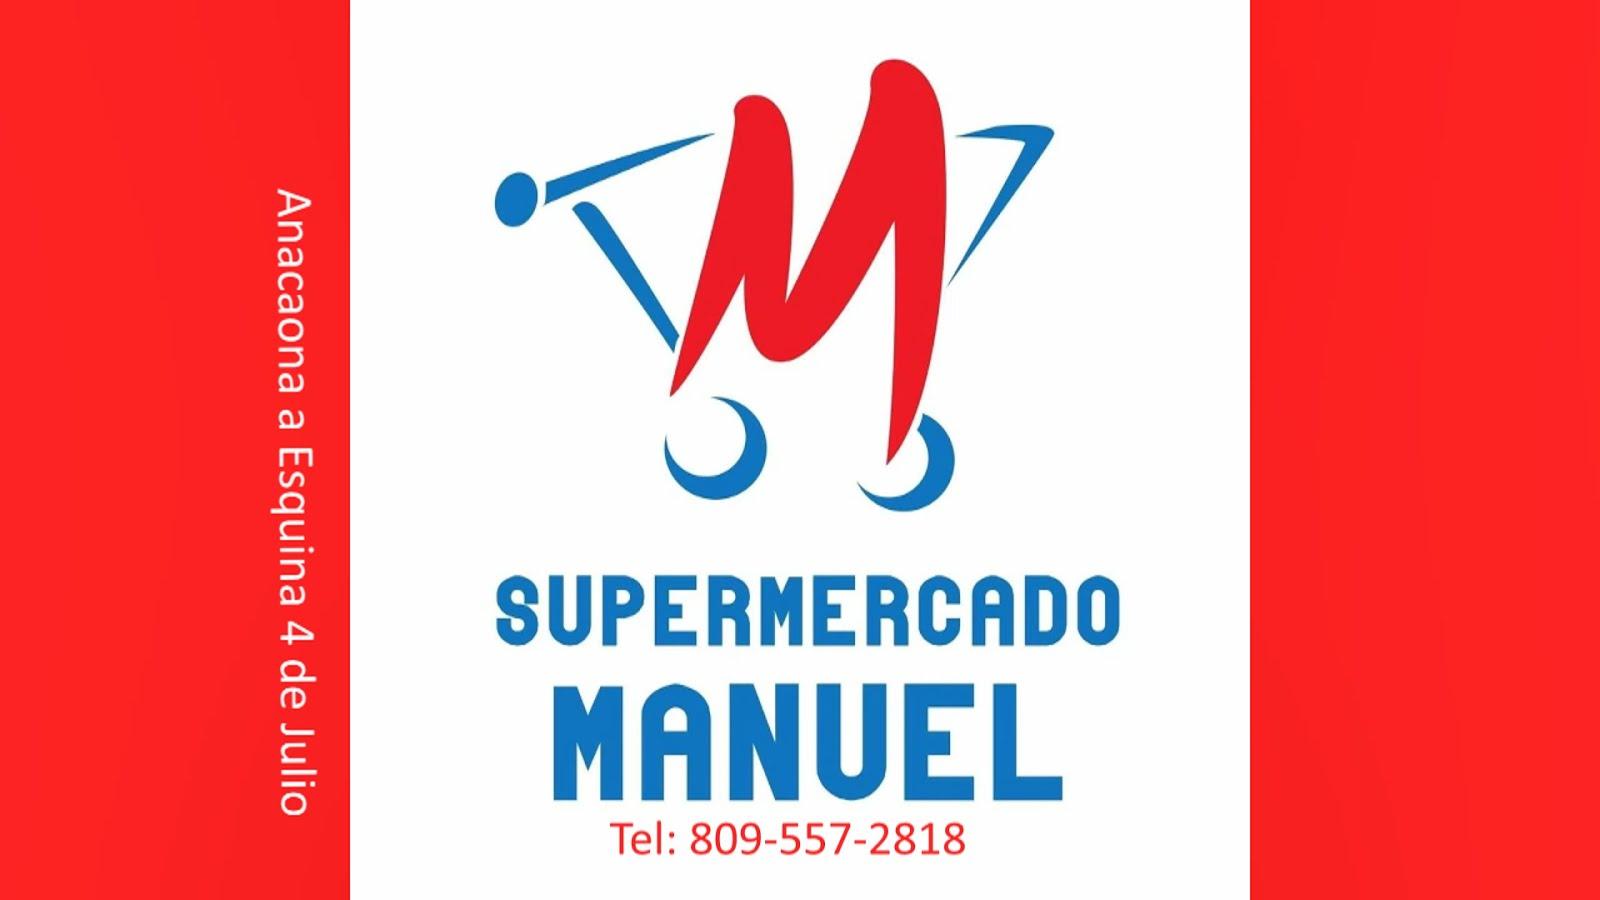 SUPERMERCADO MANUEL